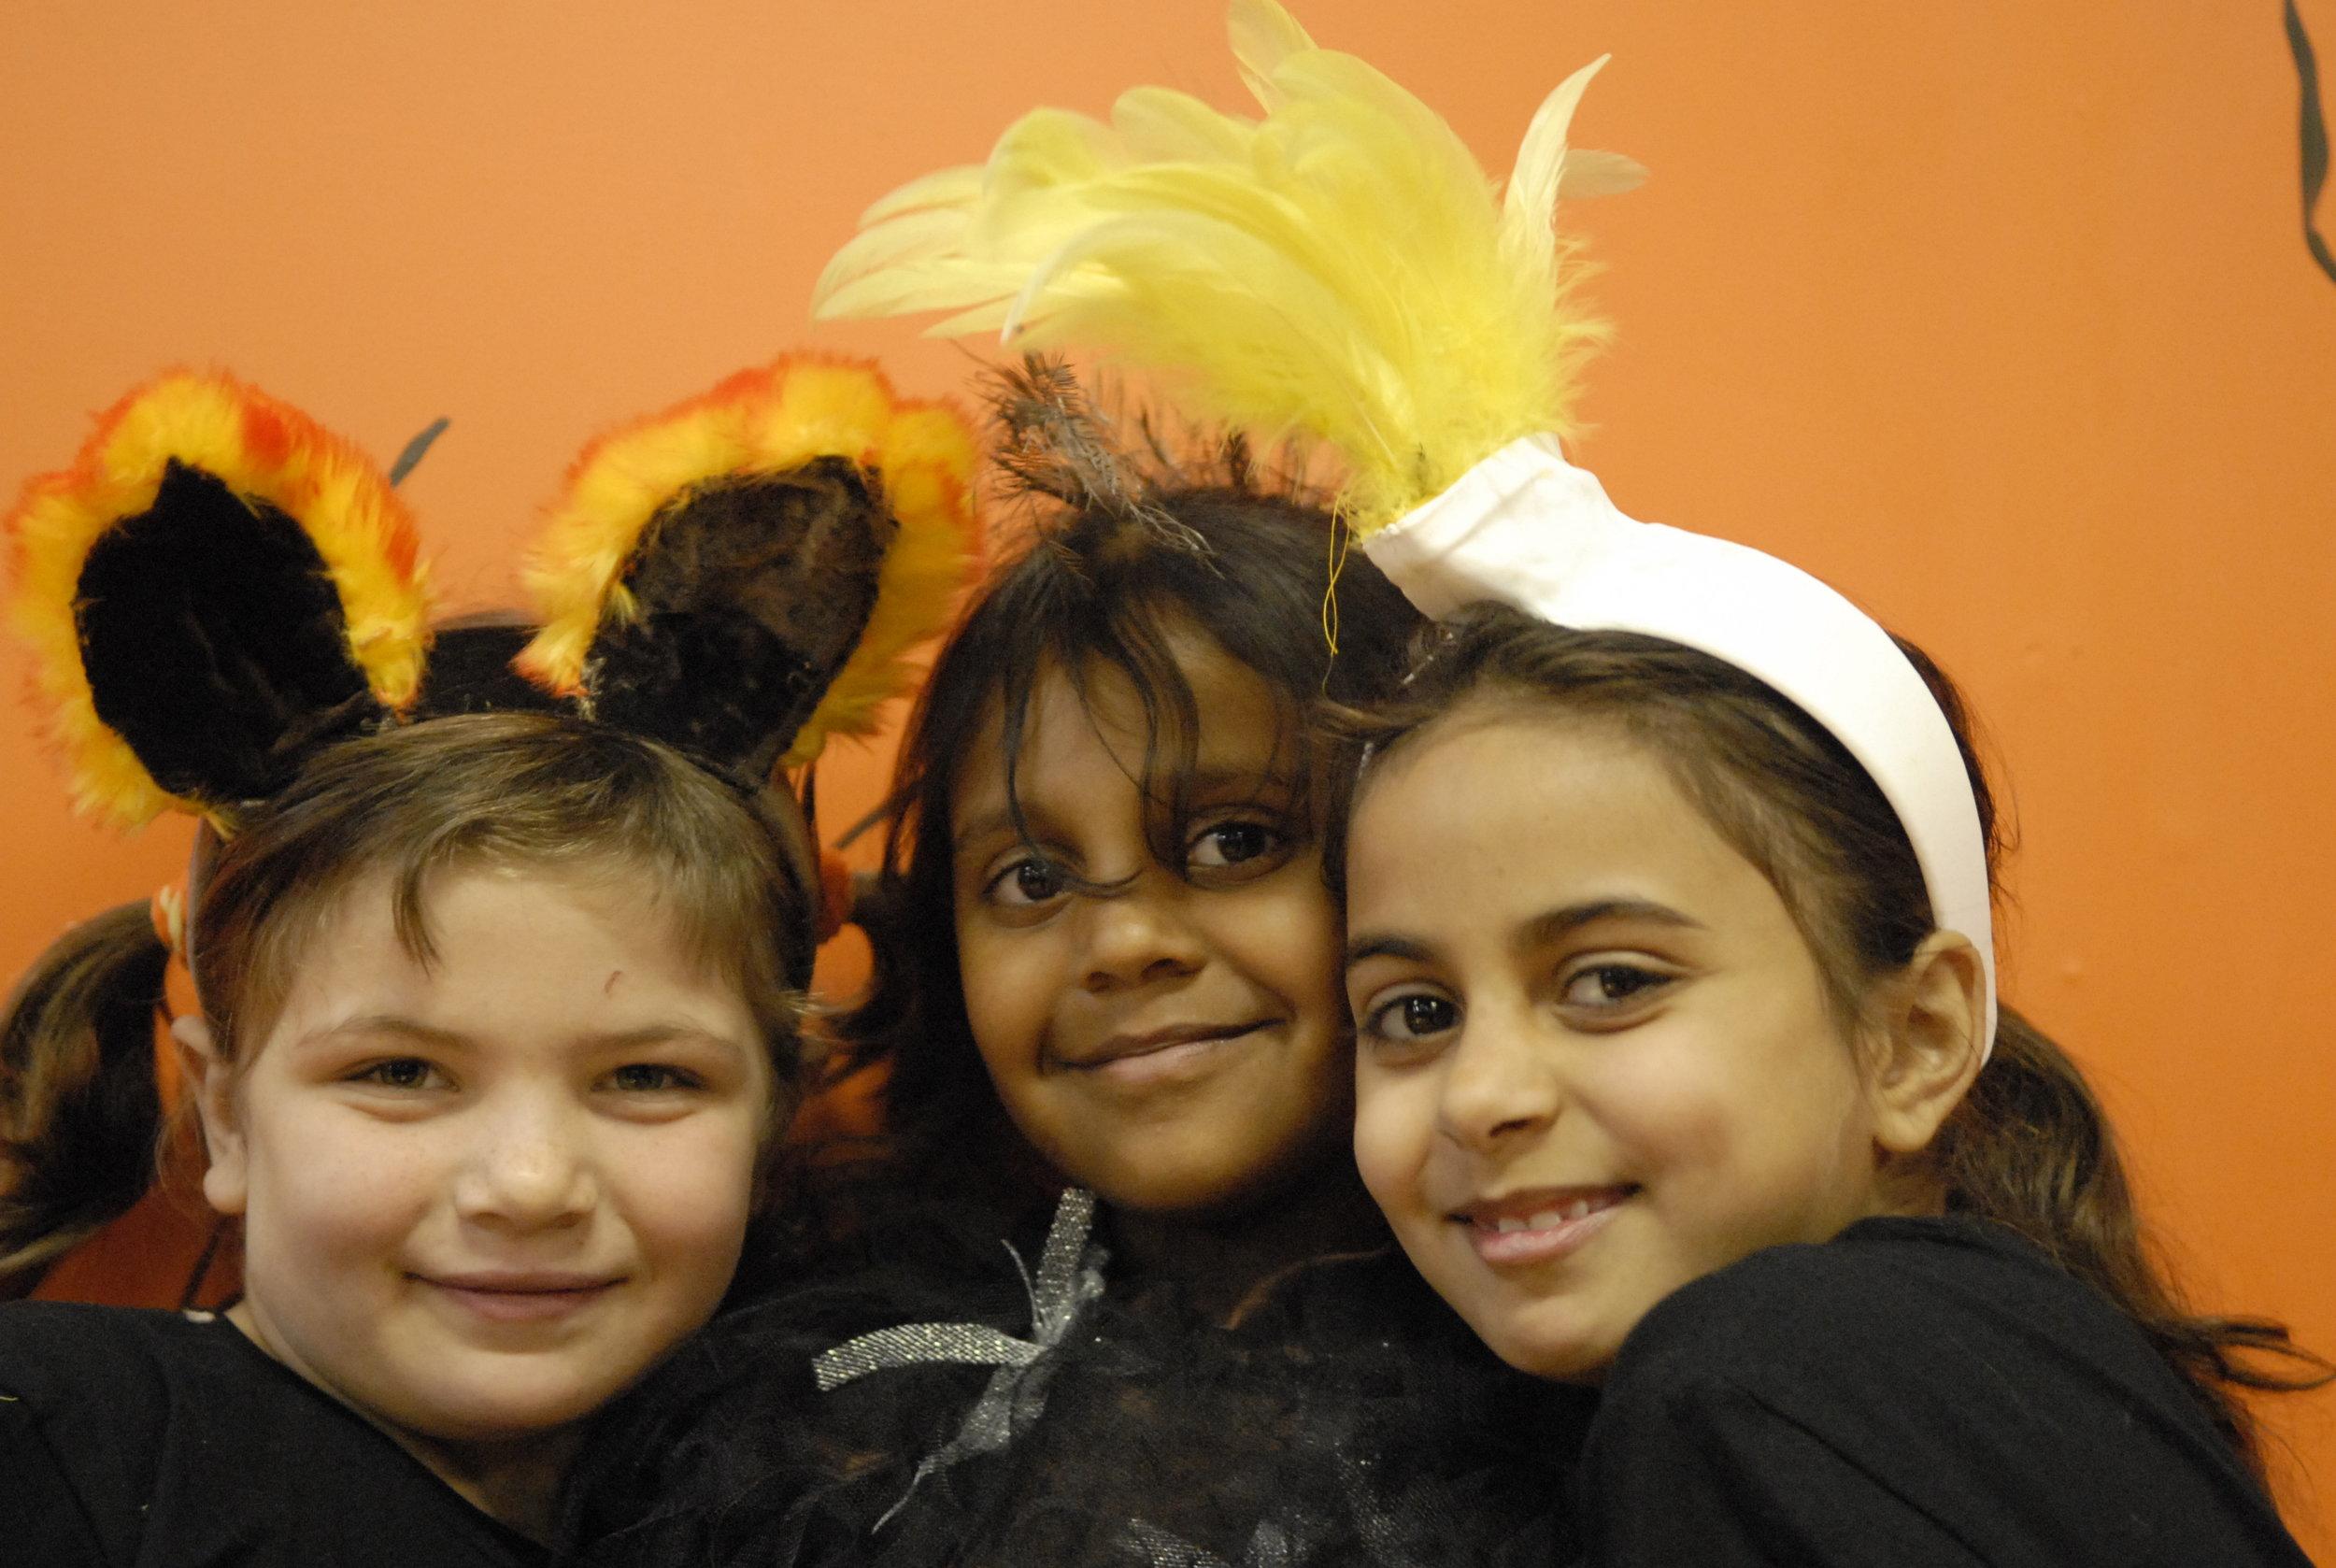 Aboriginal girls happy in costume as native Australain animals dingo, emu and cockatoo for the Kangaroo Rock video clip